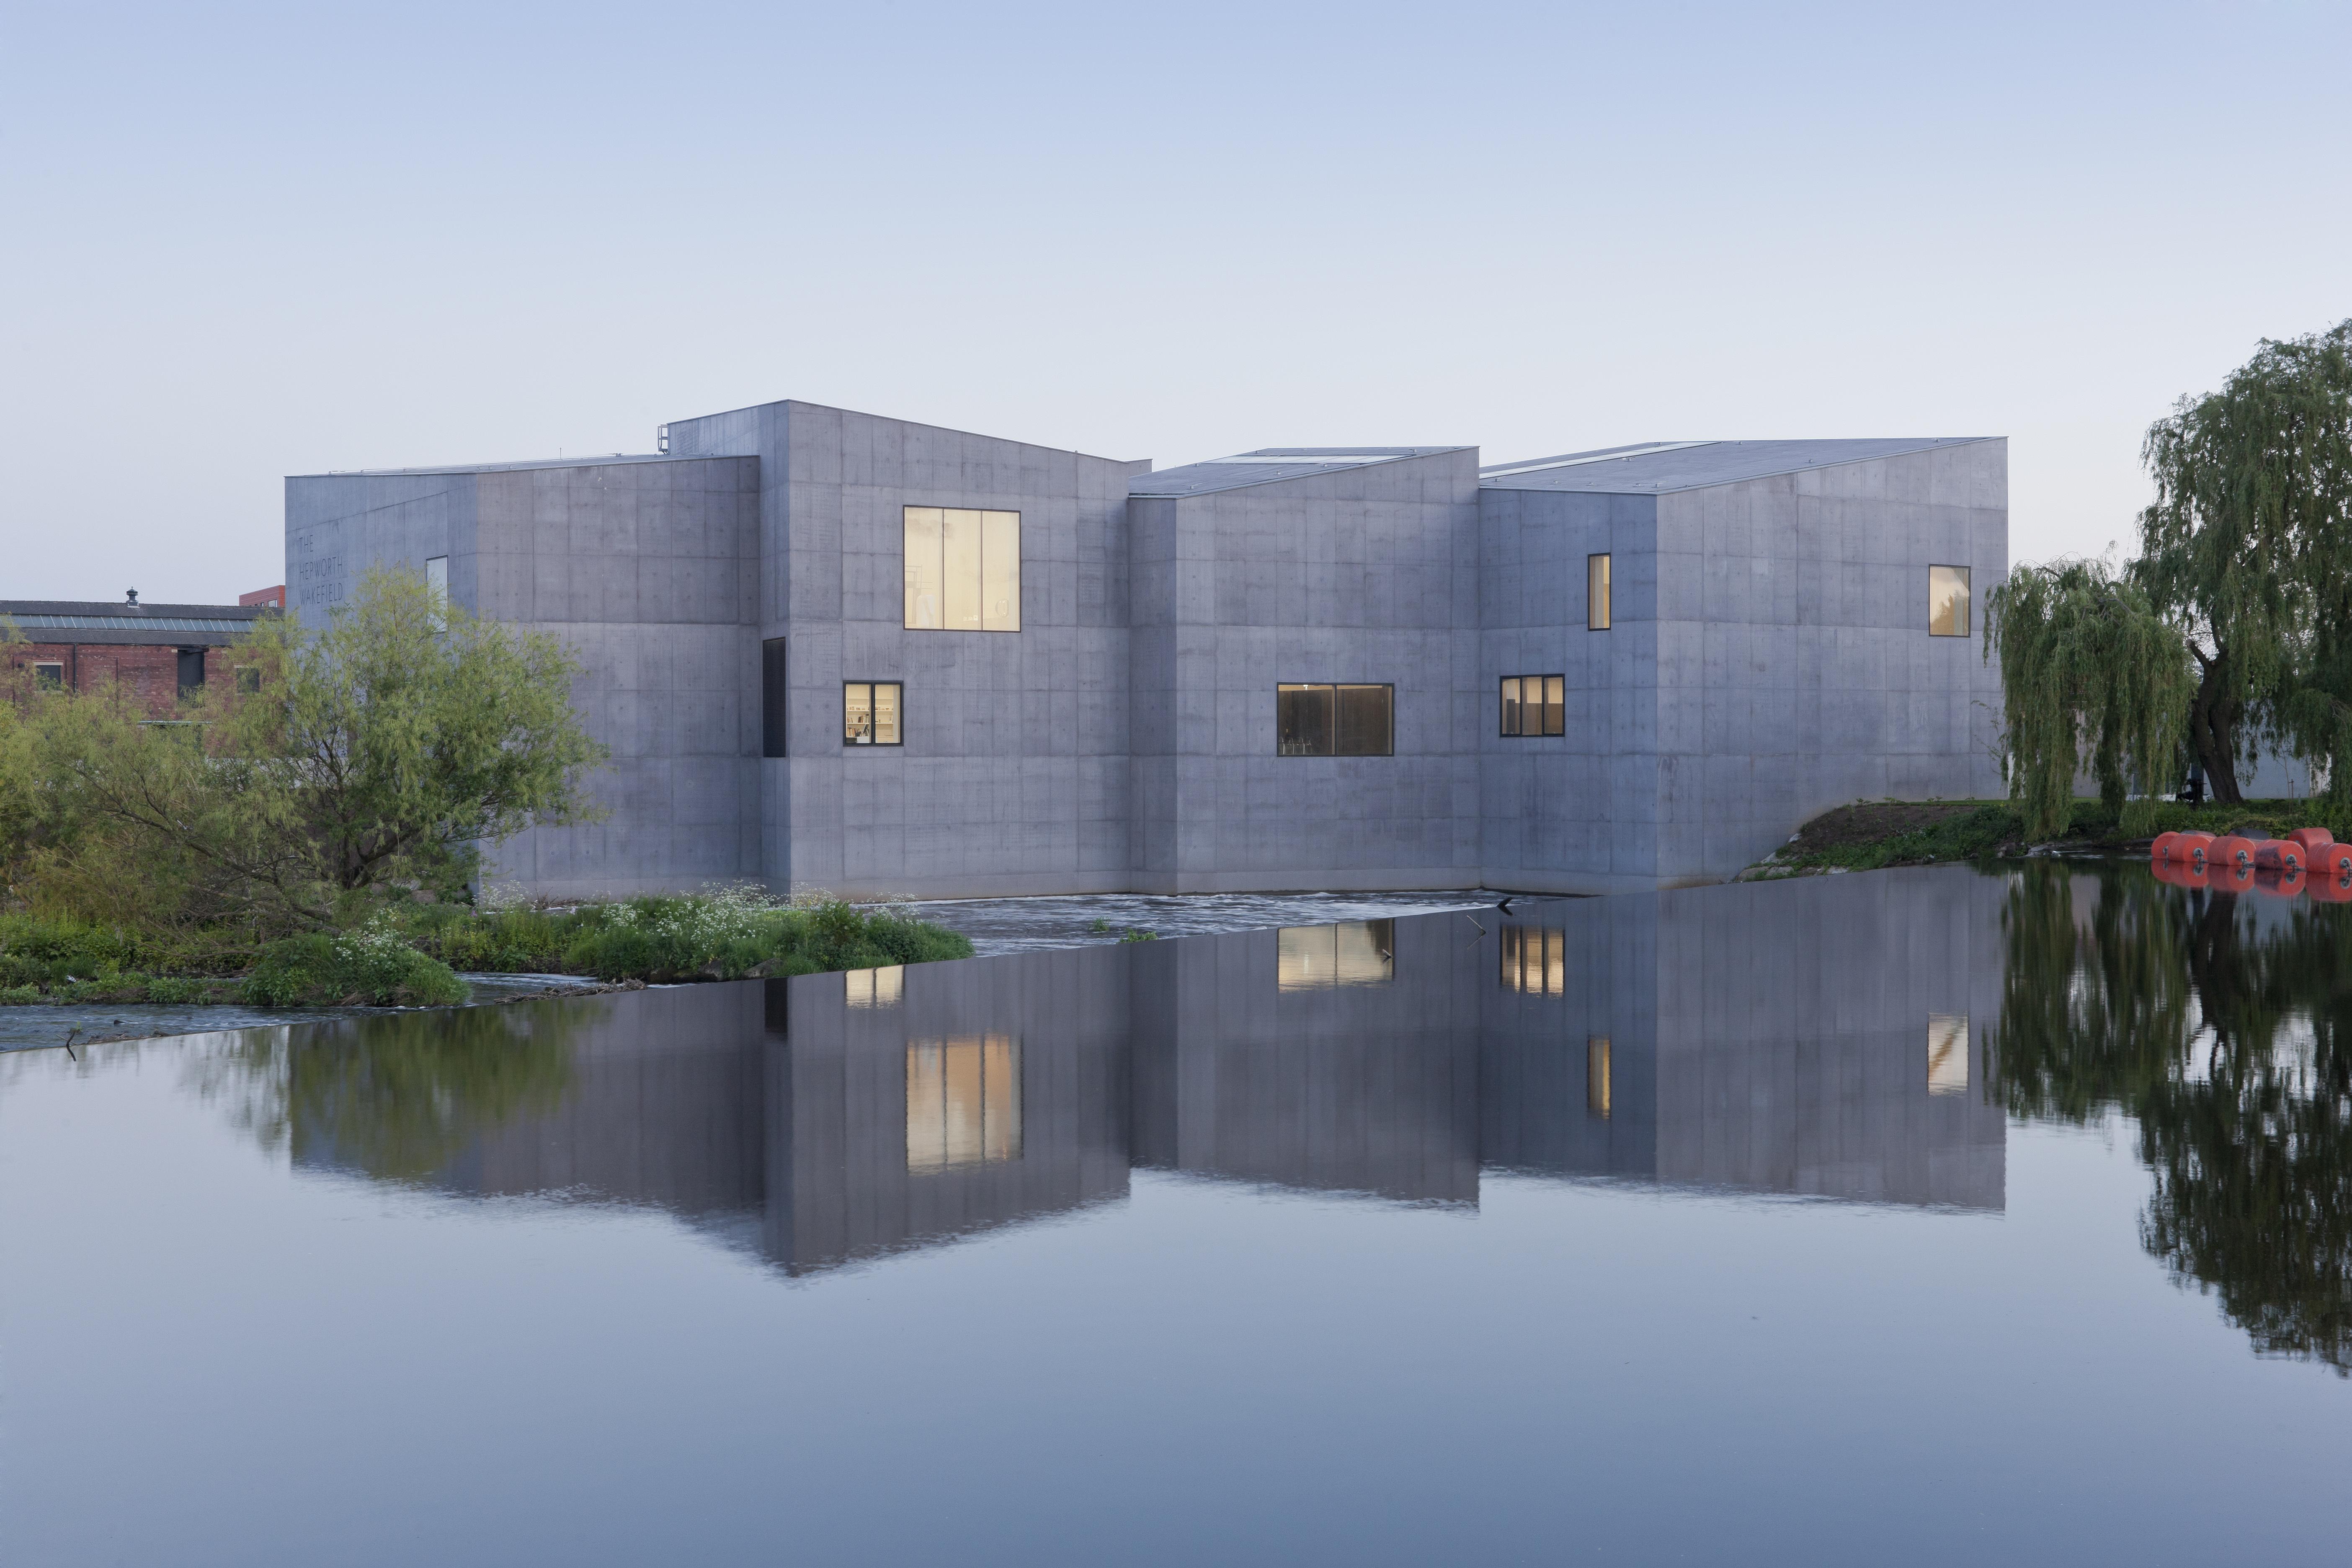 David Chipperfield Architect: Hepworth